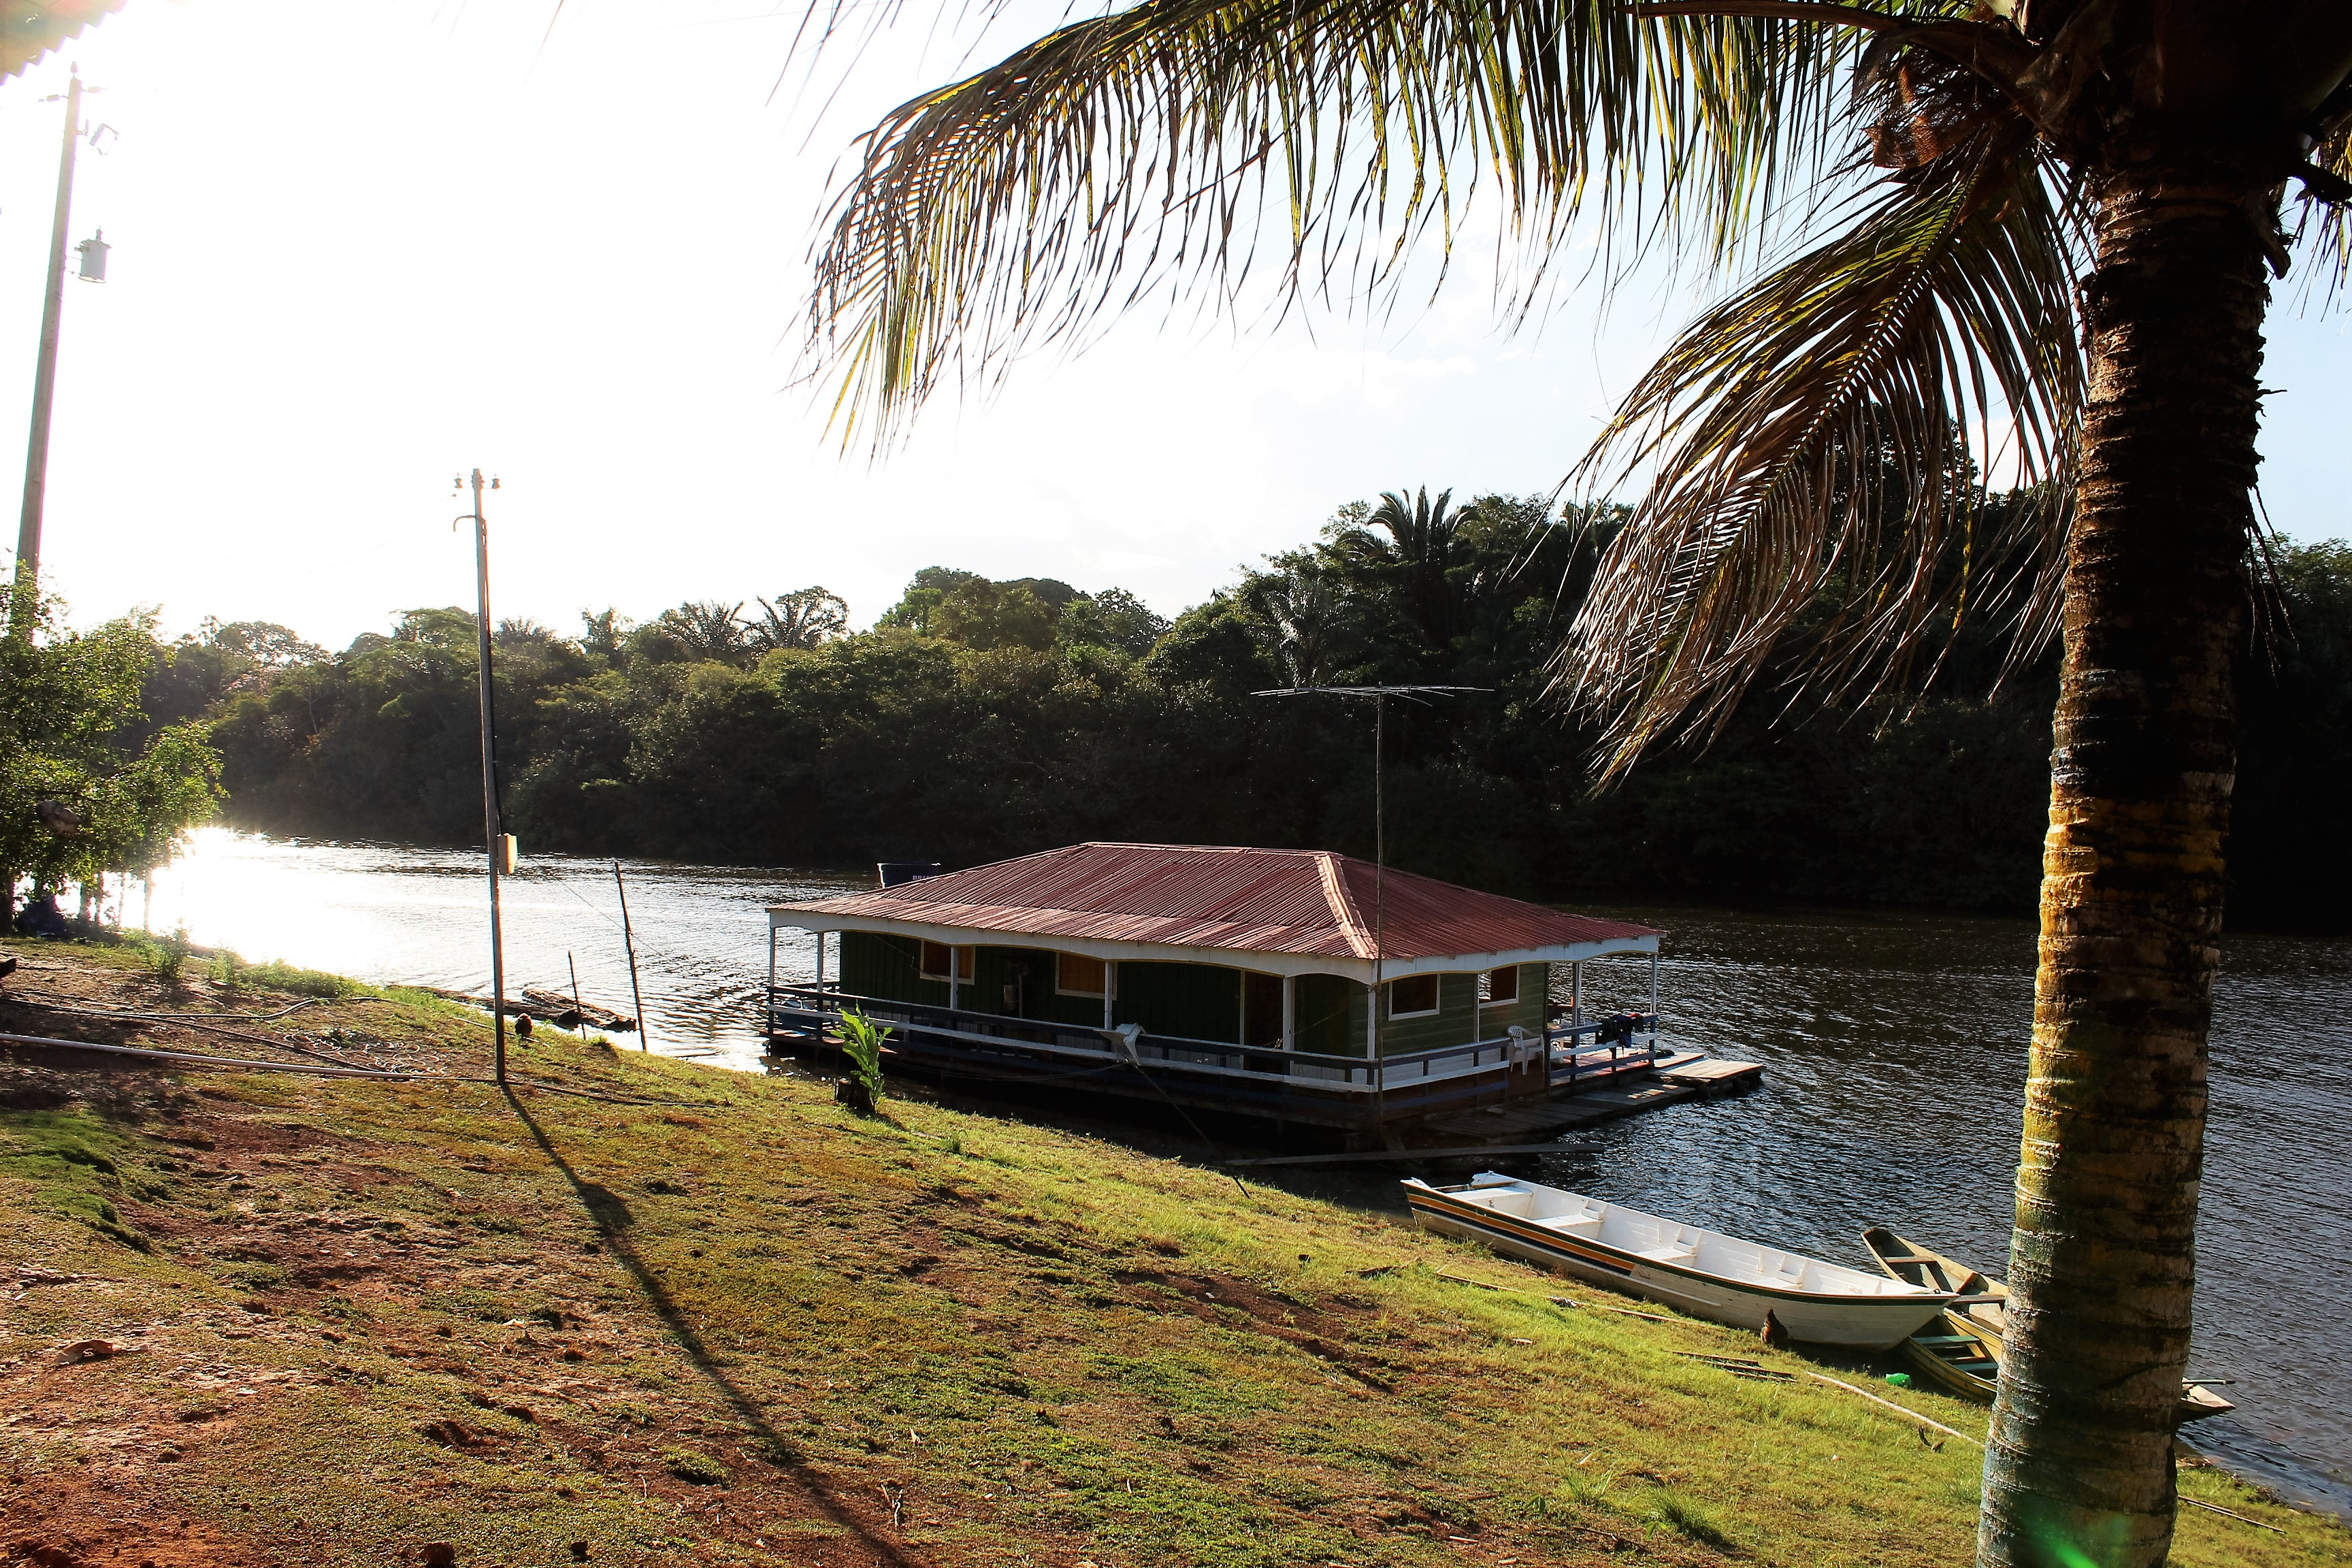 Manaquiri Amazonas fonte: upload.wikimedia.org